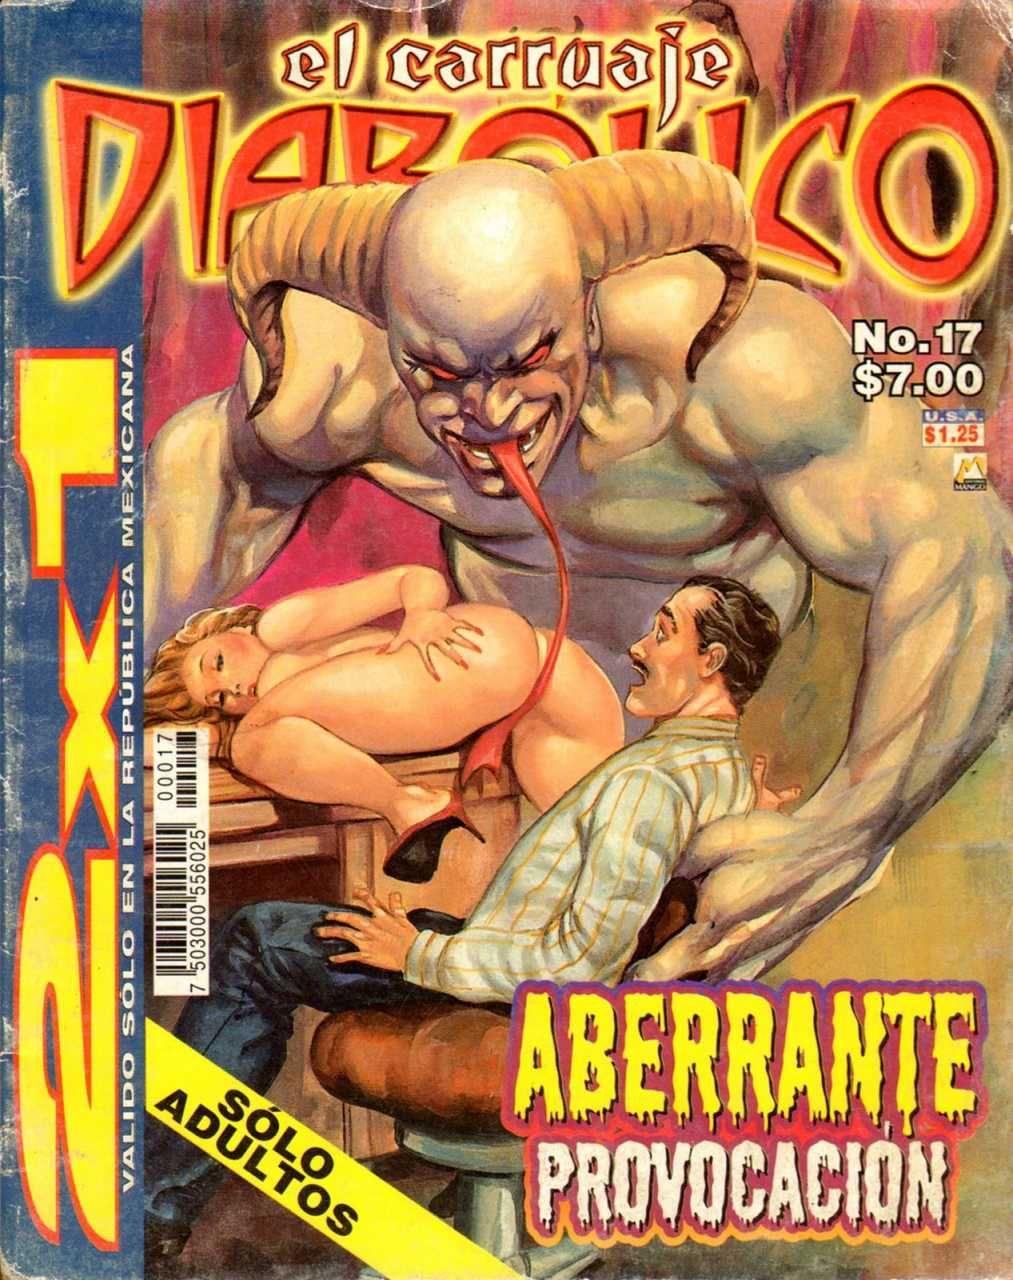 Mexican sexy comic art — photo 1